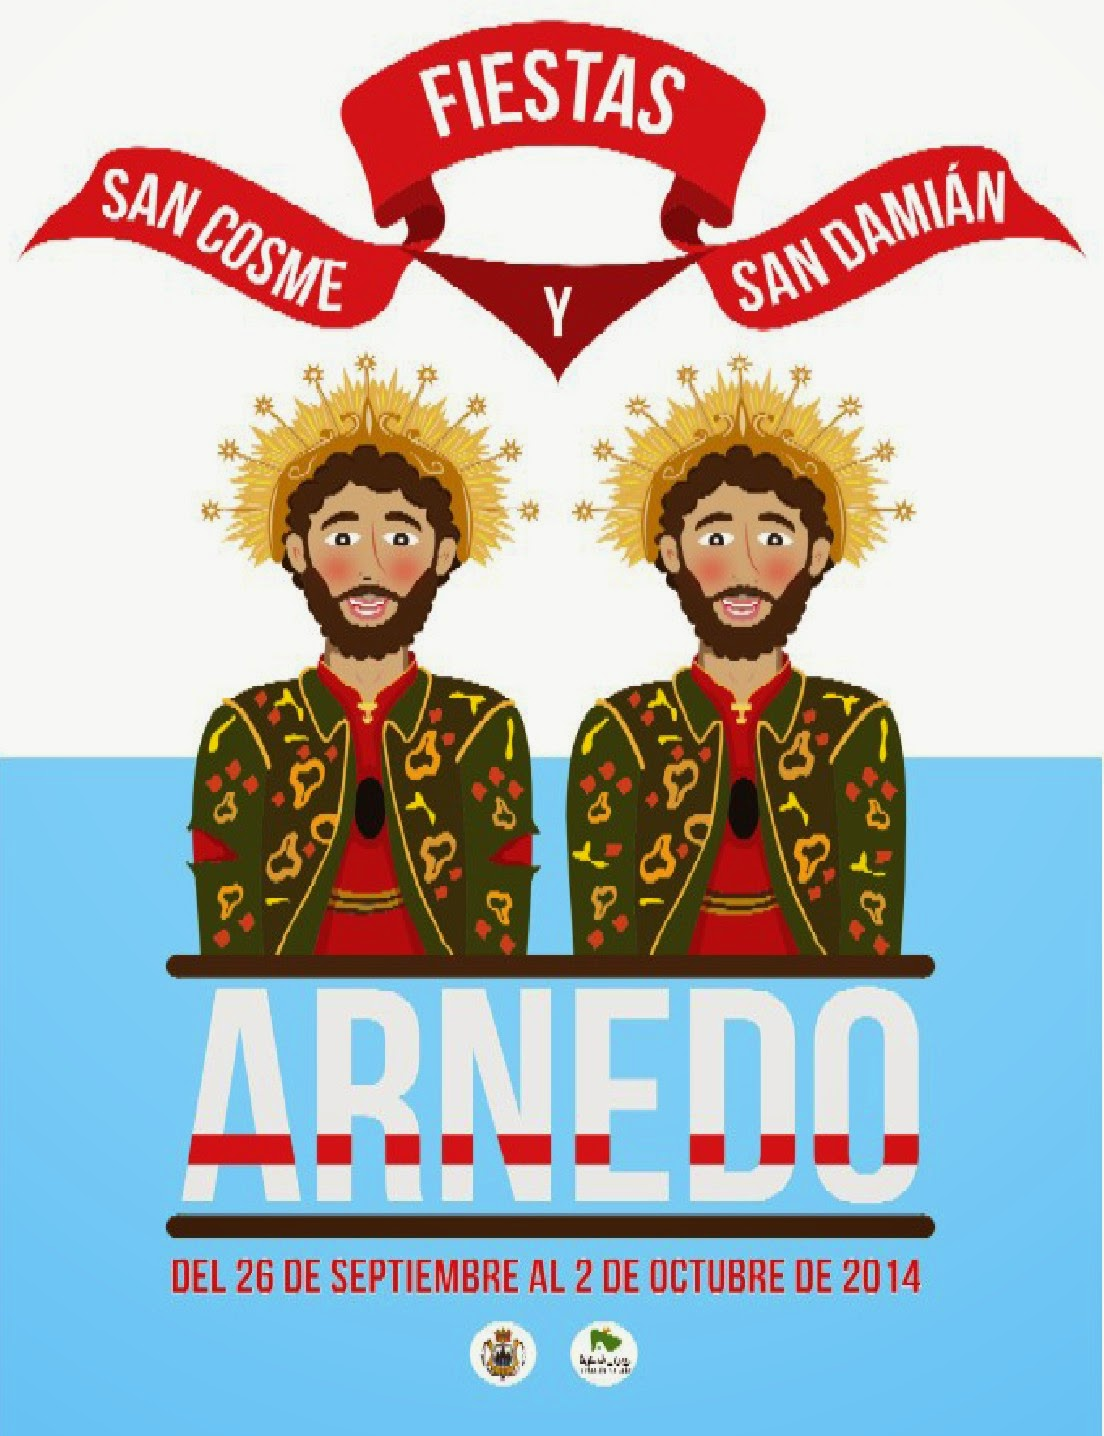 PROGRAMA FIESTAS SAN COSME Y SAN DAMIÁN 2014